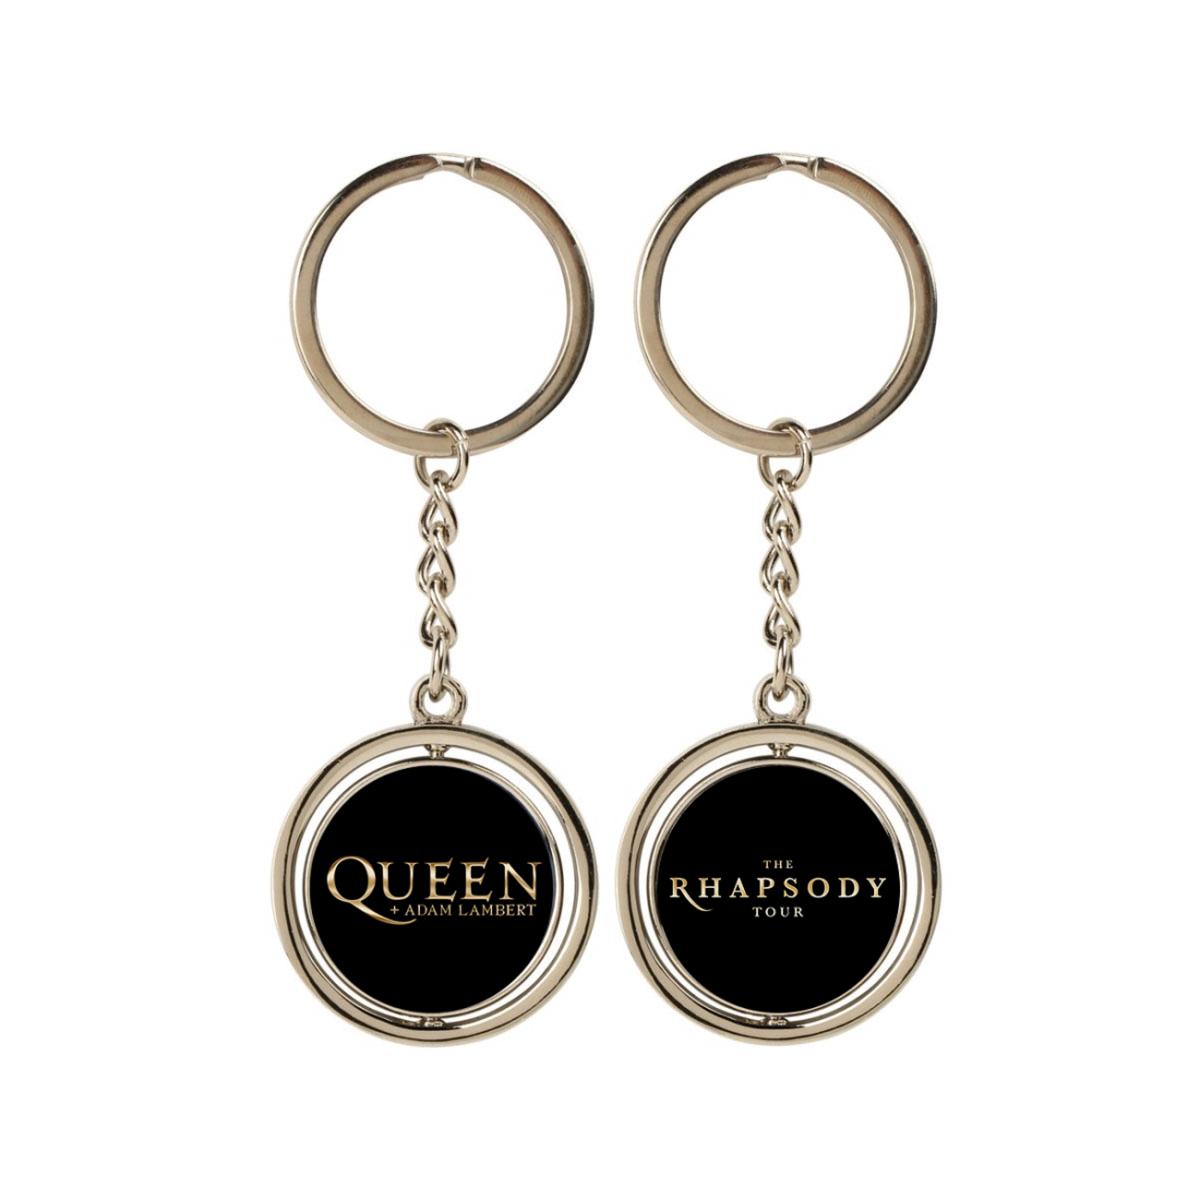 Rhapsody Tour Spinning Keychain